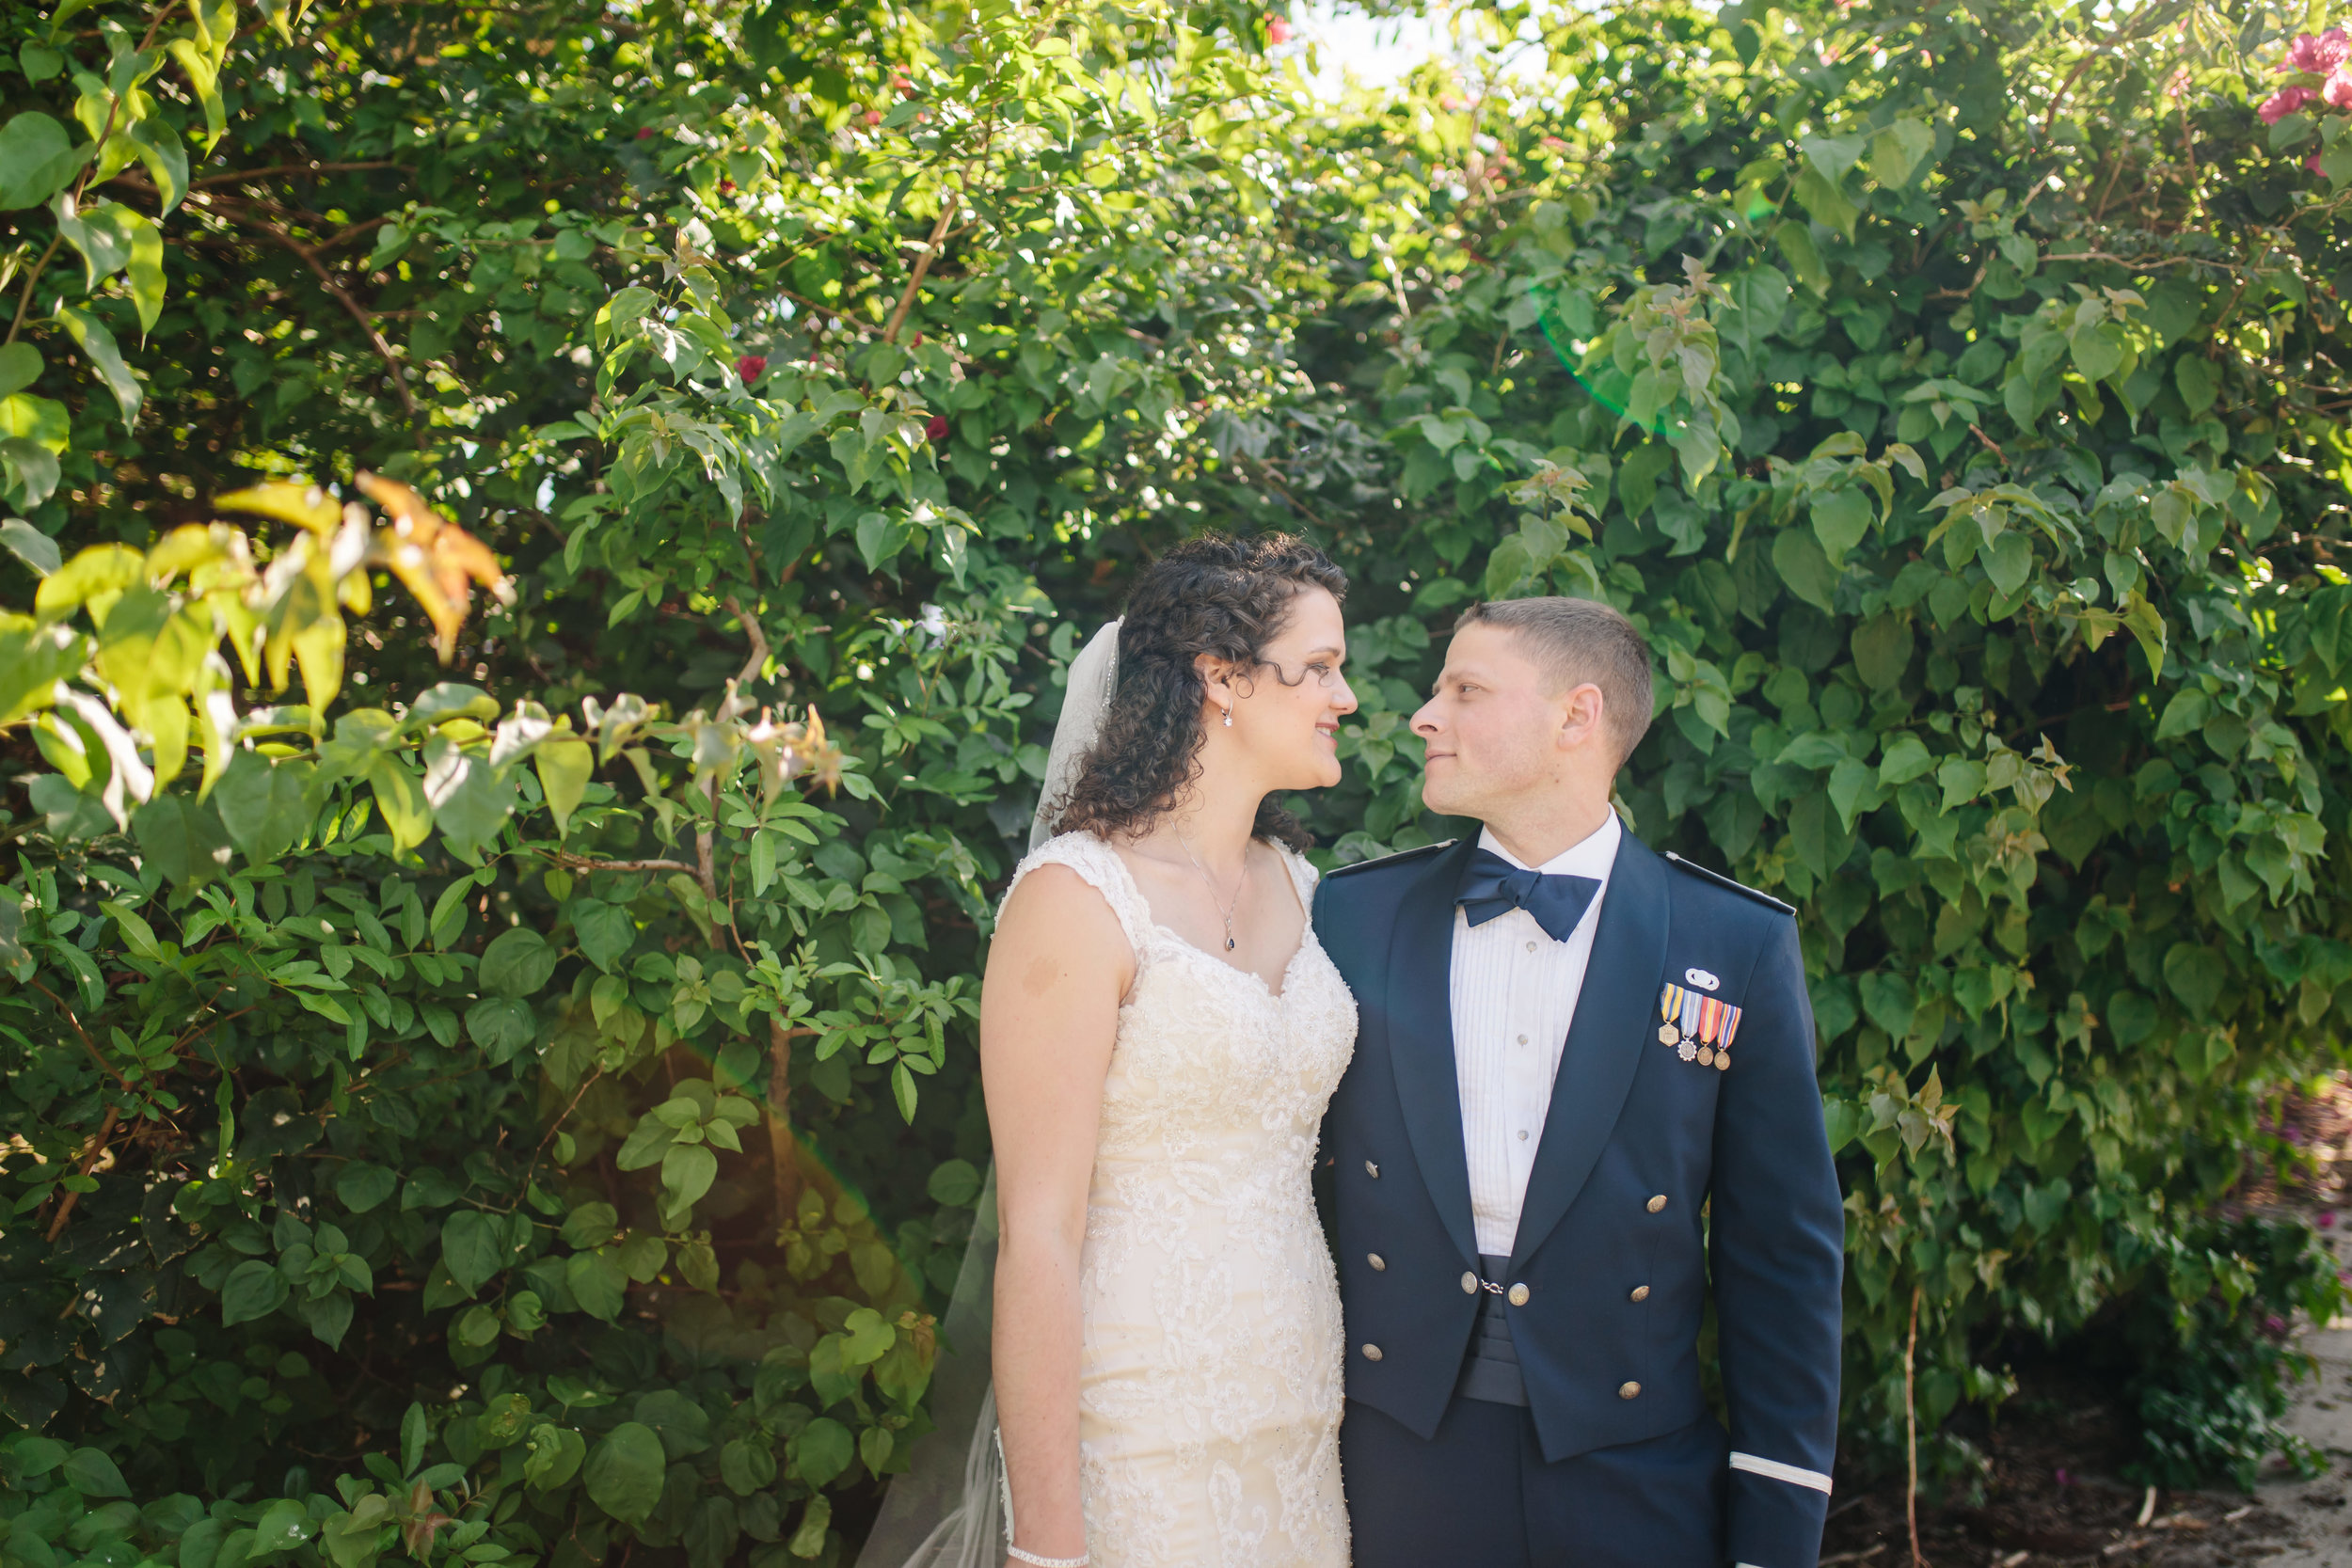 2018.03.17 Allison and Chuck Wedding Waelti Melbourne (504 of 569).jpg